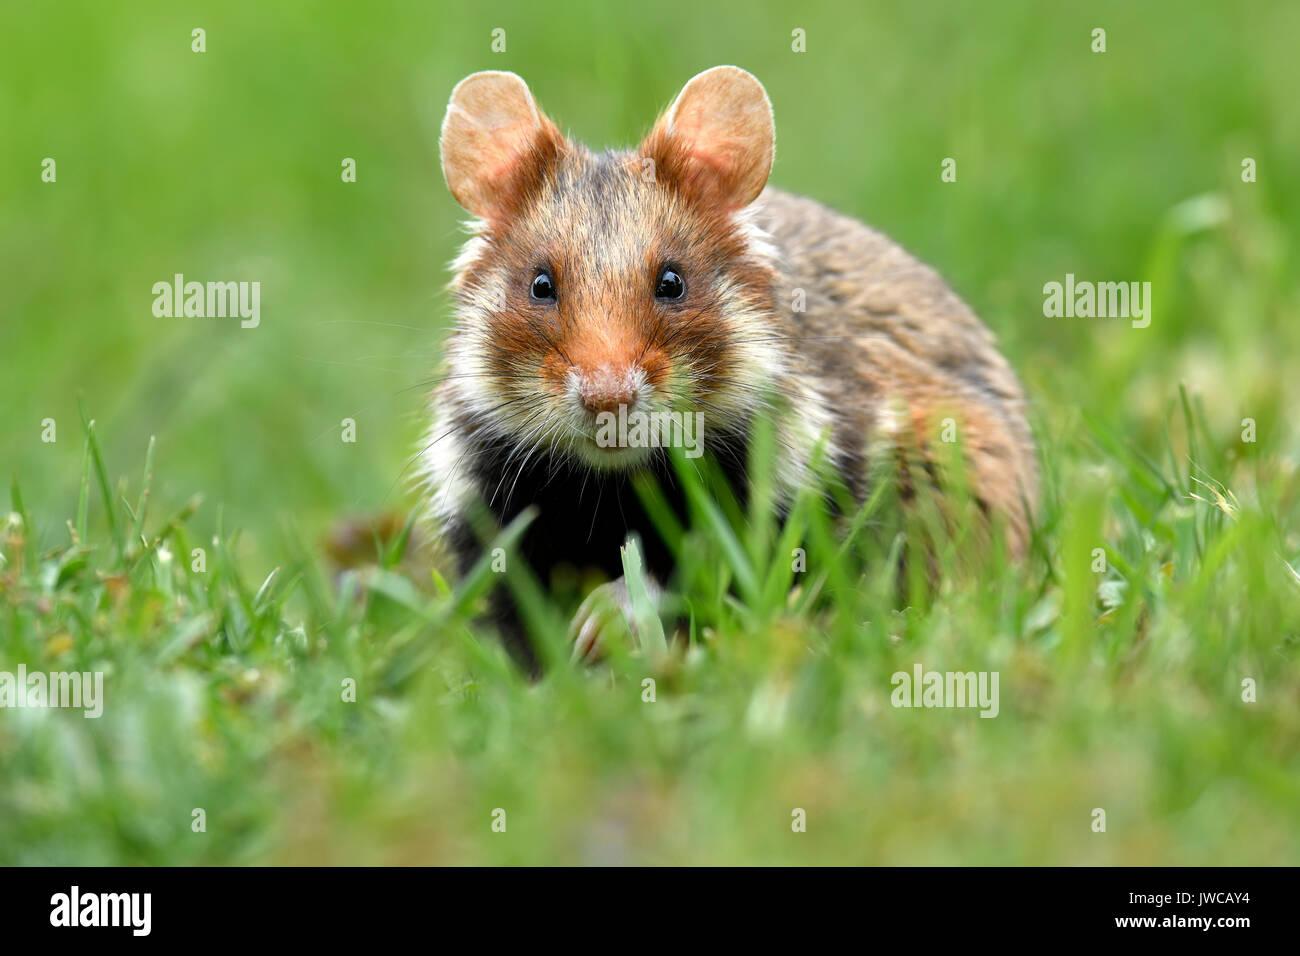 FEuropean hamster (Cricetus cricetus), standing in meadow, Austria - Stock Image